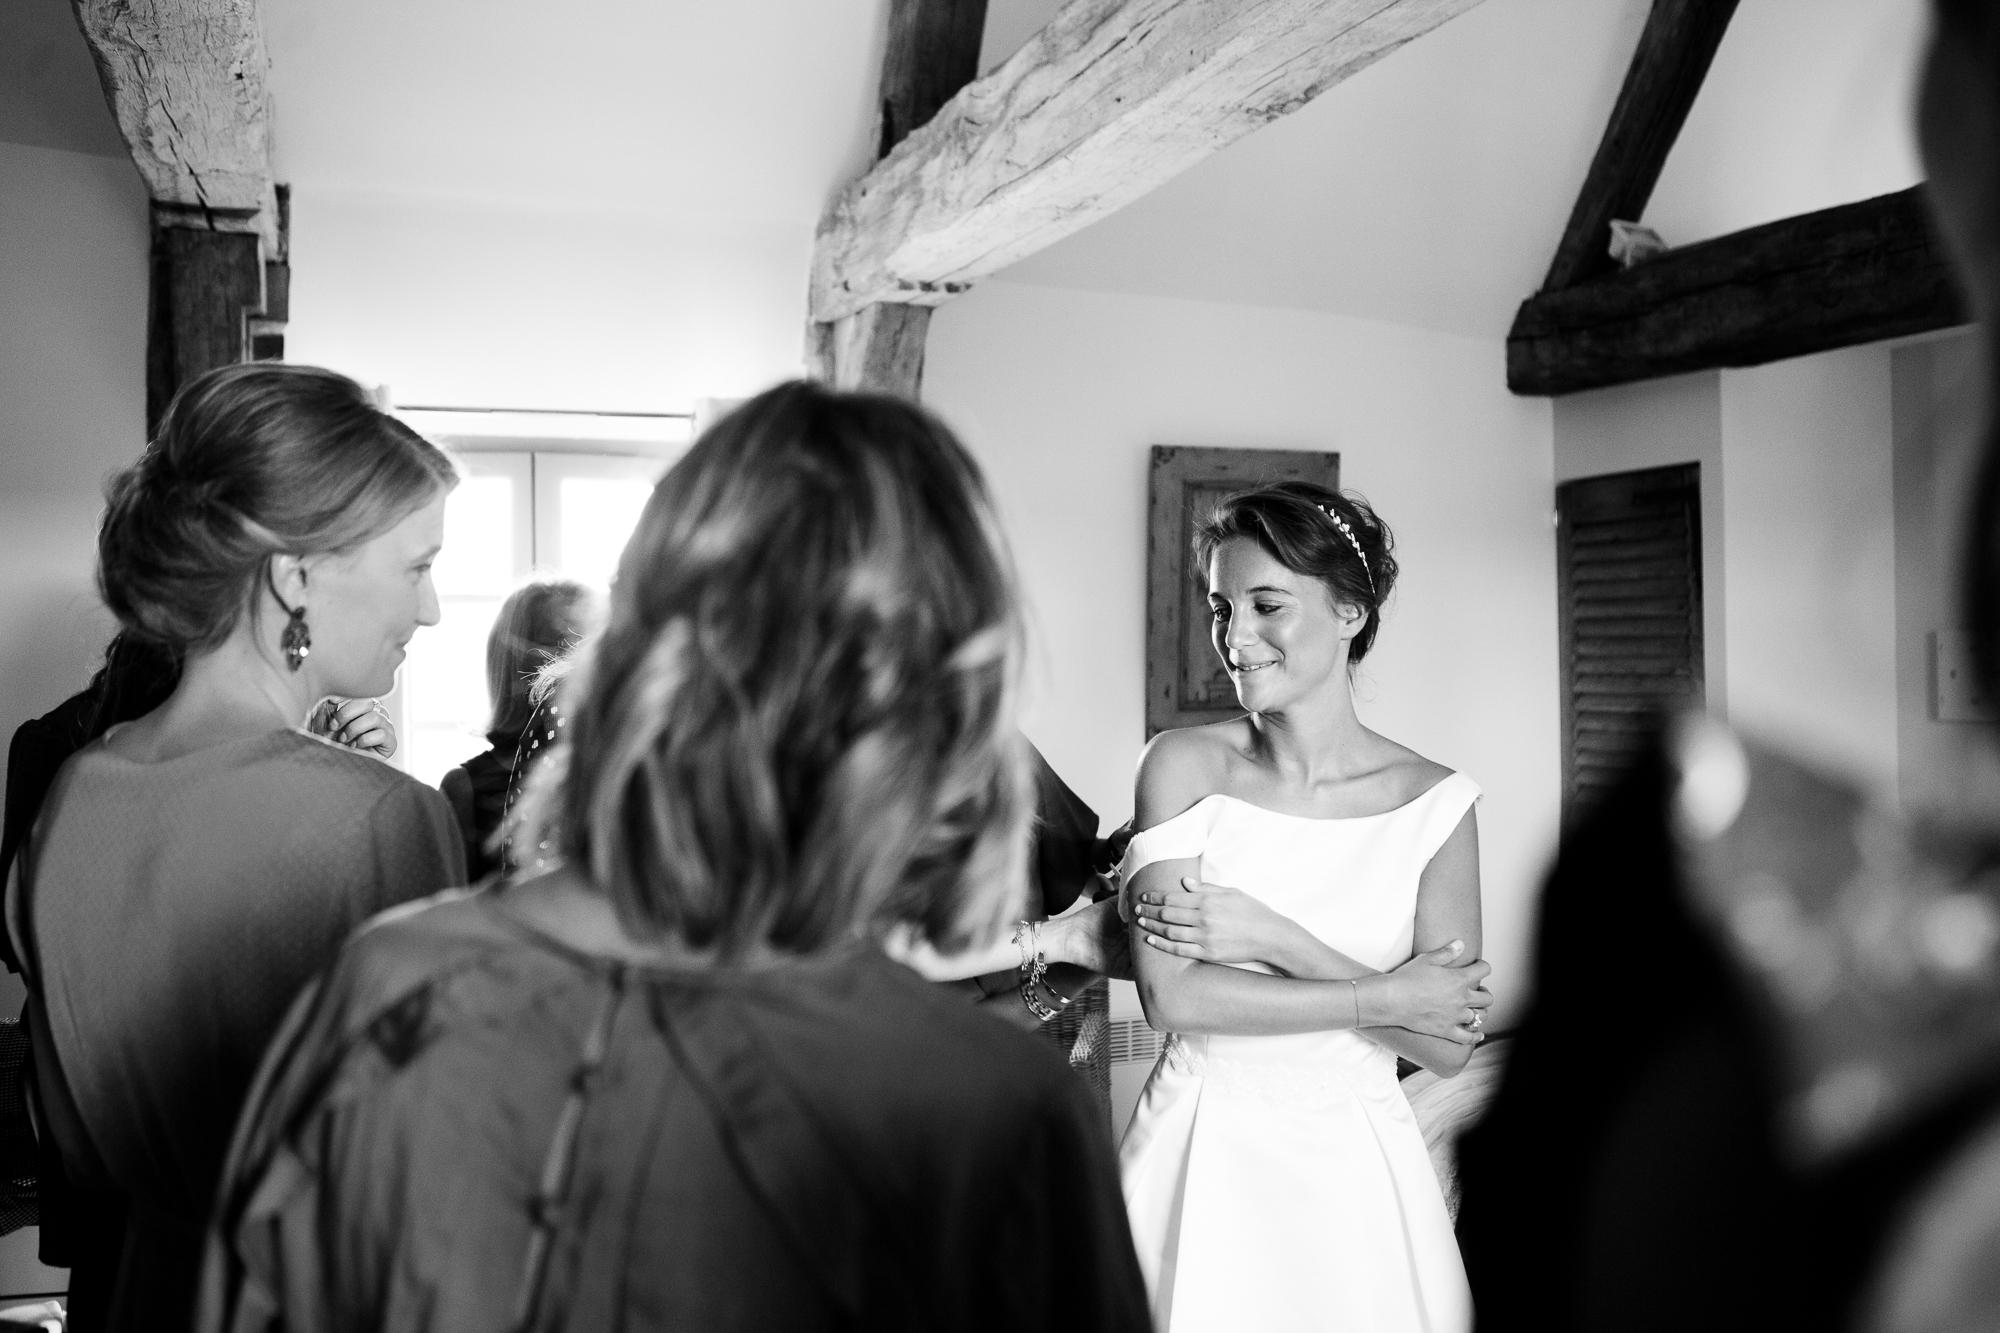 photographe mariage oise domaine boissy le bois picardie